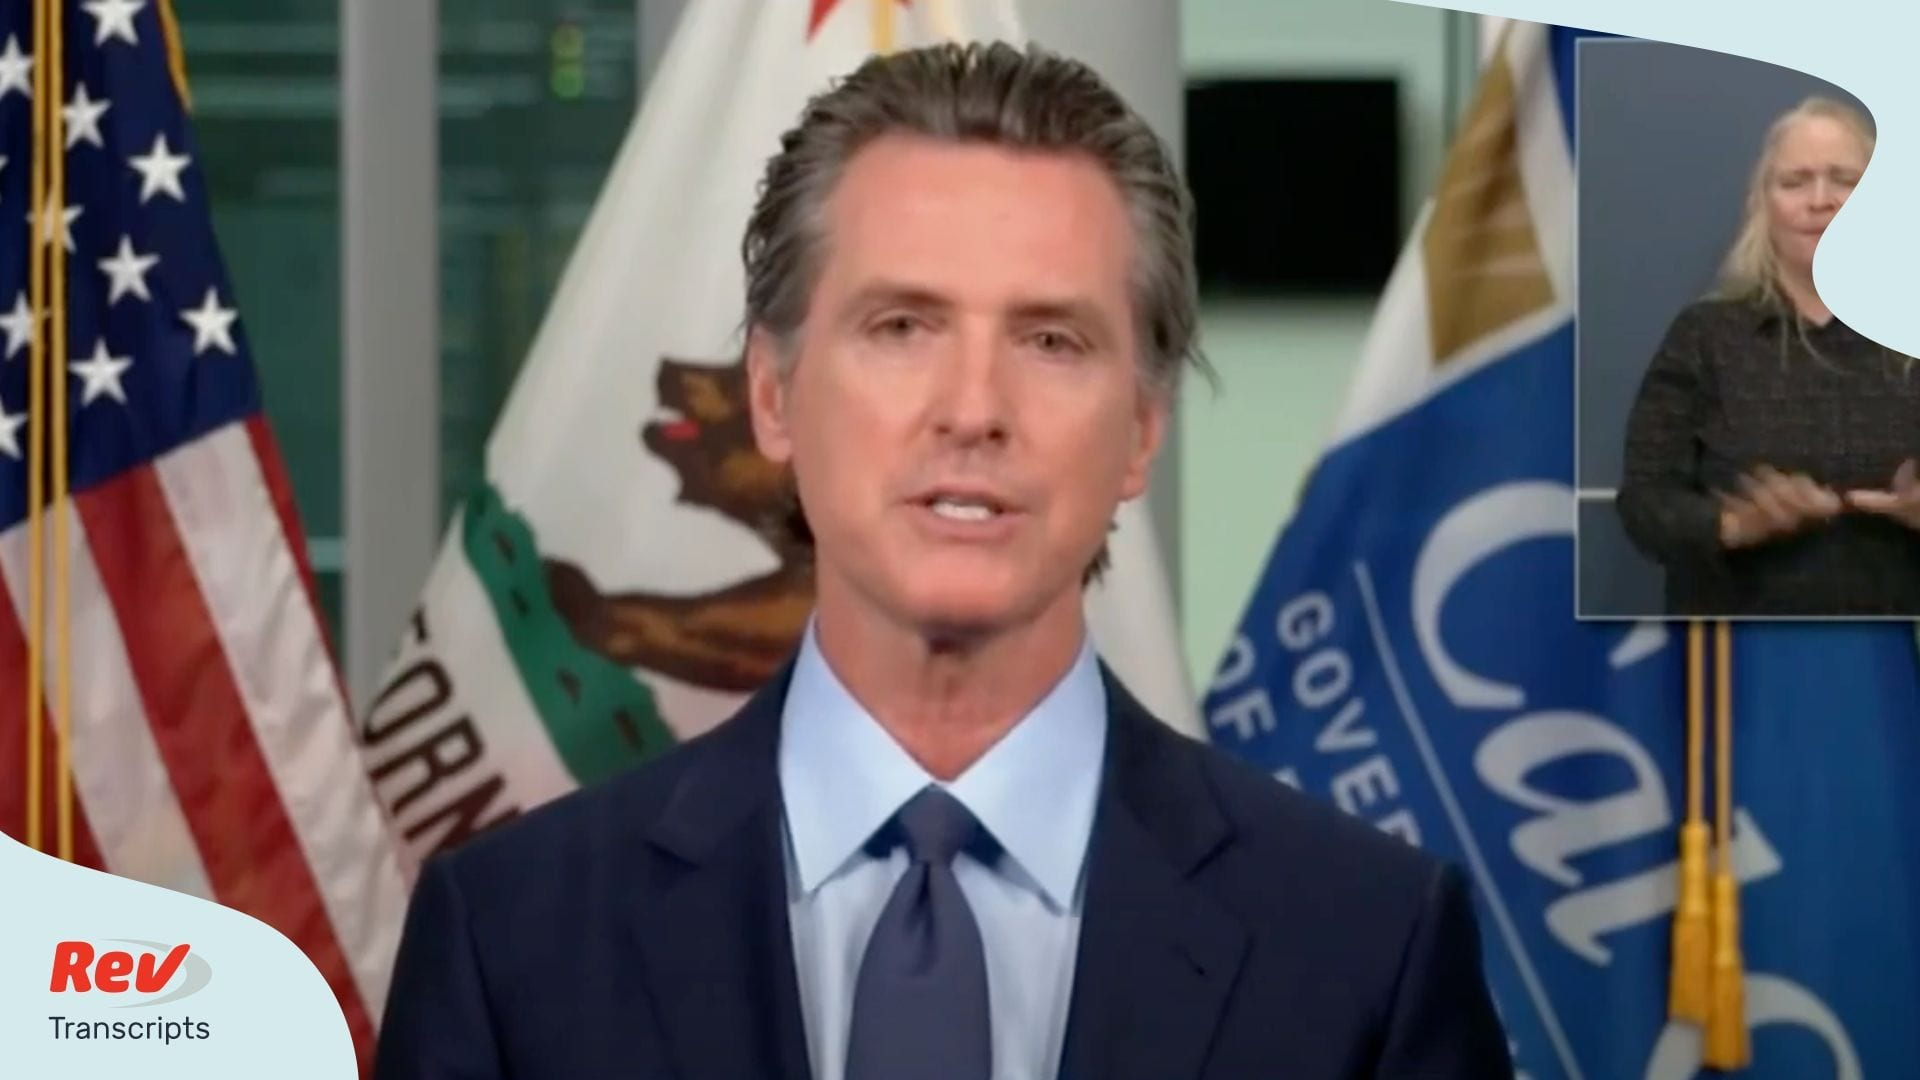 California Governor Gavin Newsom Press Conference